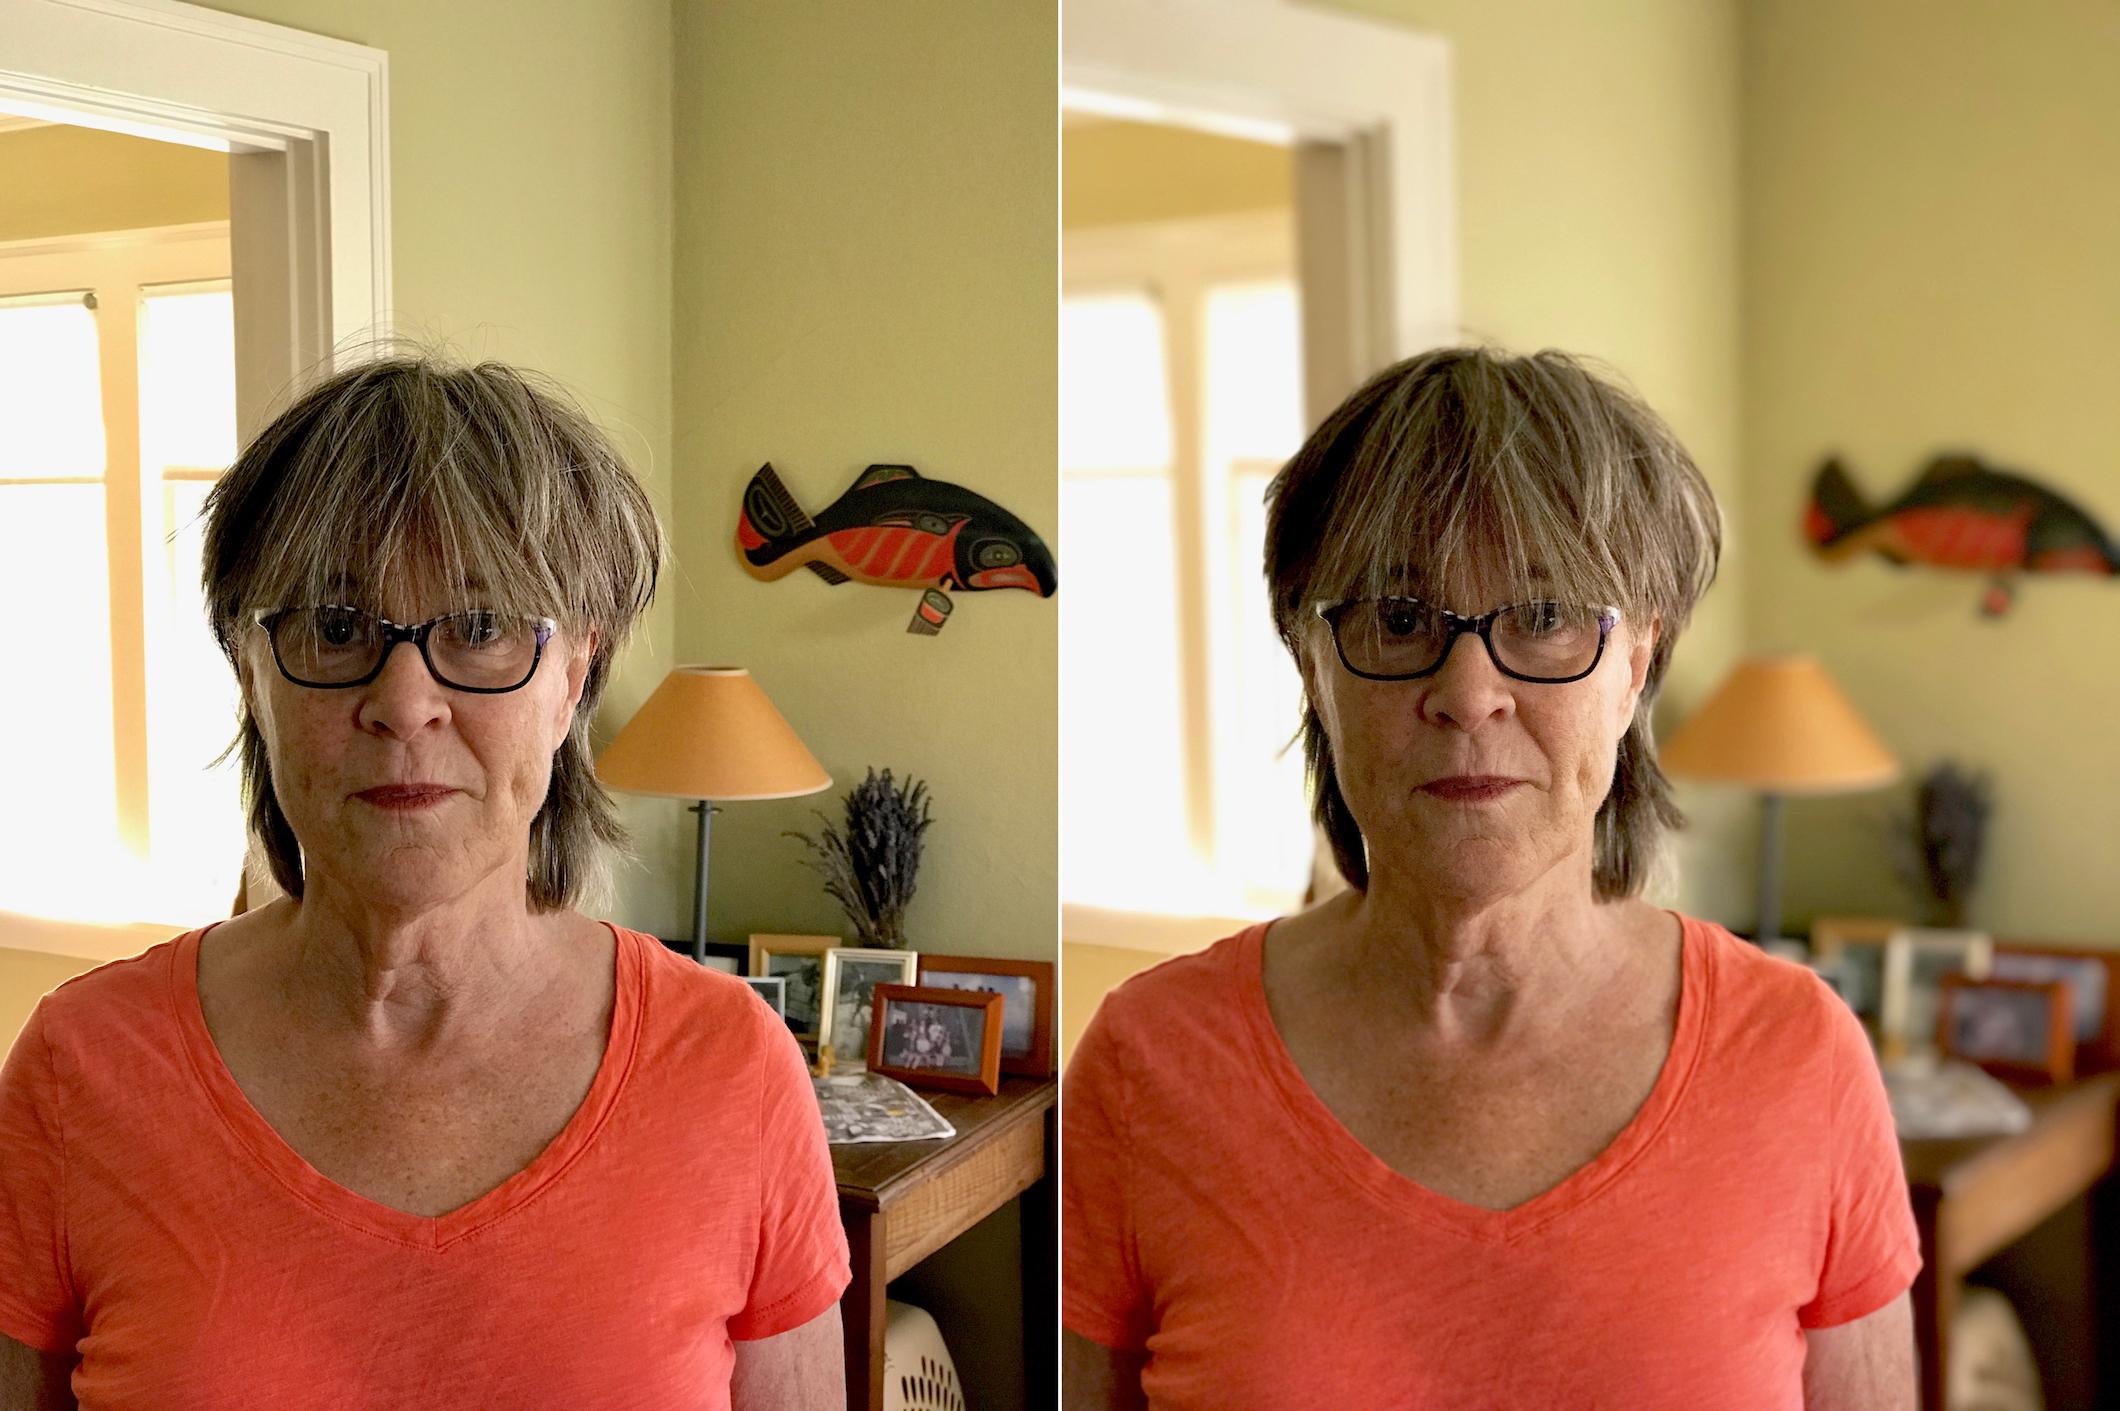 Portrait Mode In Iphone